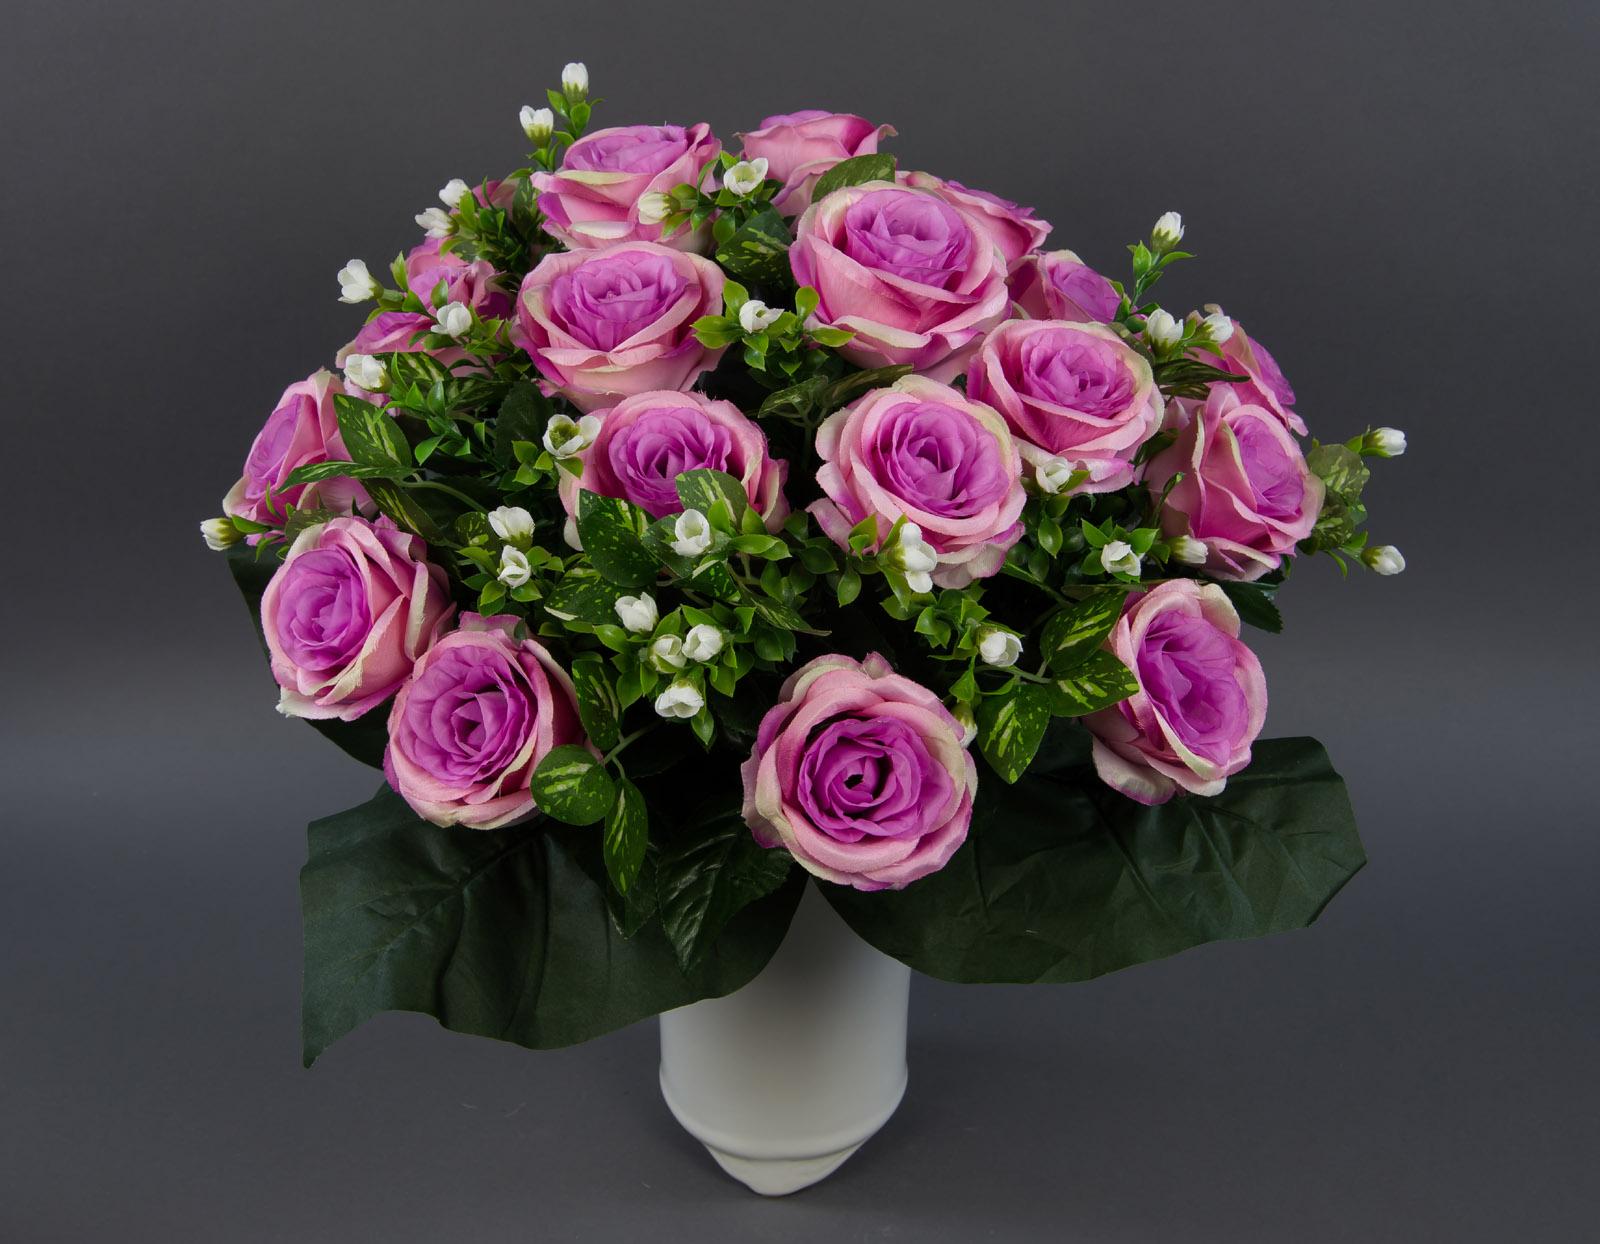 gro er rosenstrau 45x45cm fuchsia rosa creme lm k nstliche rosen kunstblumen 4260355156784 ebay. Black Bedroom Furniture Sets. Home Design Ideas